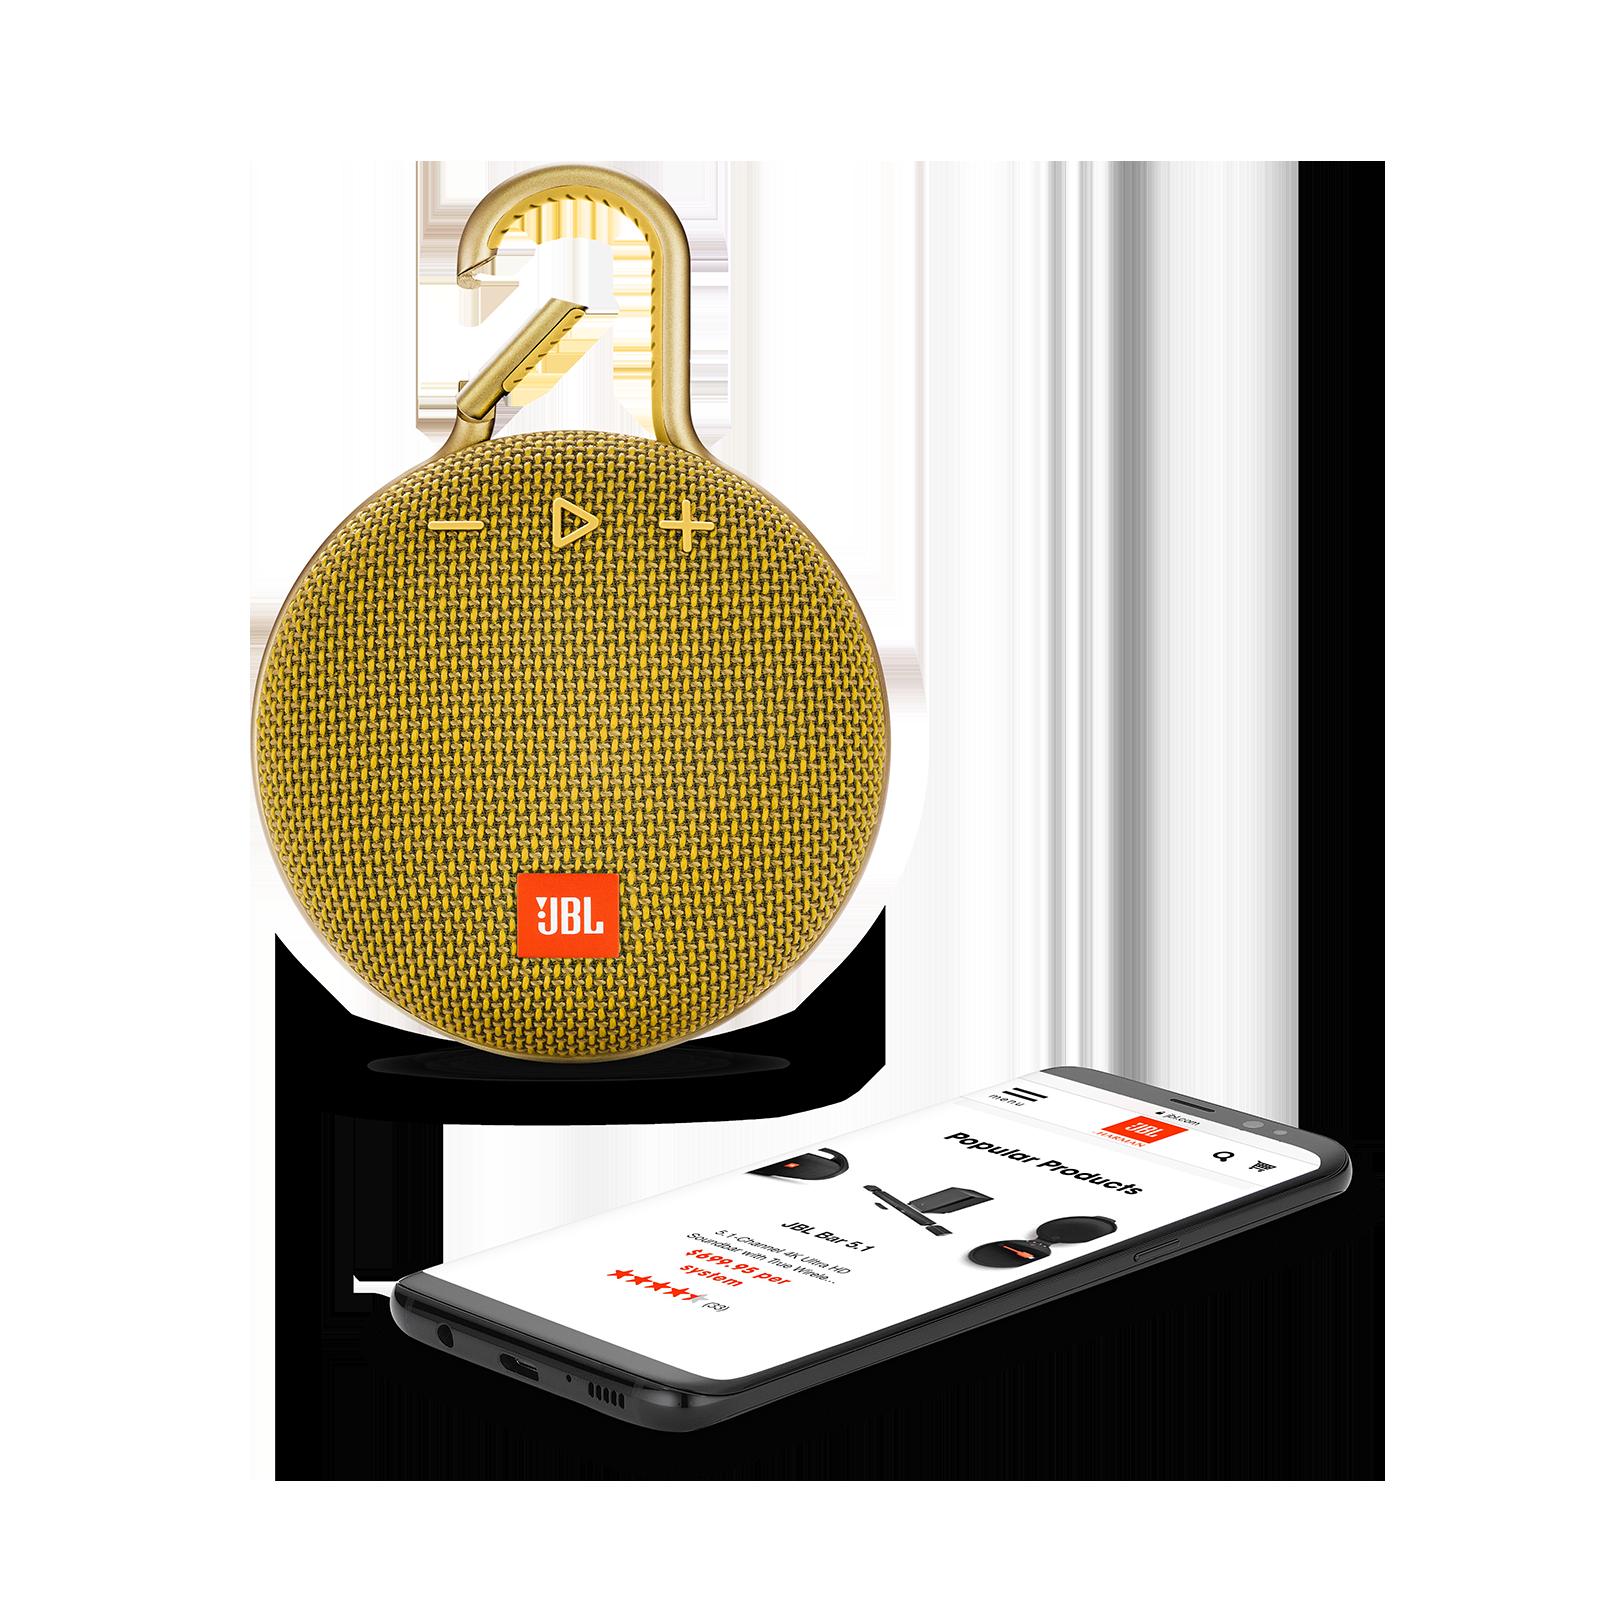 JBL CLIP 3 - Mustard Yellow - Portable Bluetooth® speaker - Detailshot 1